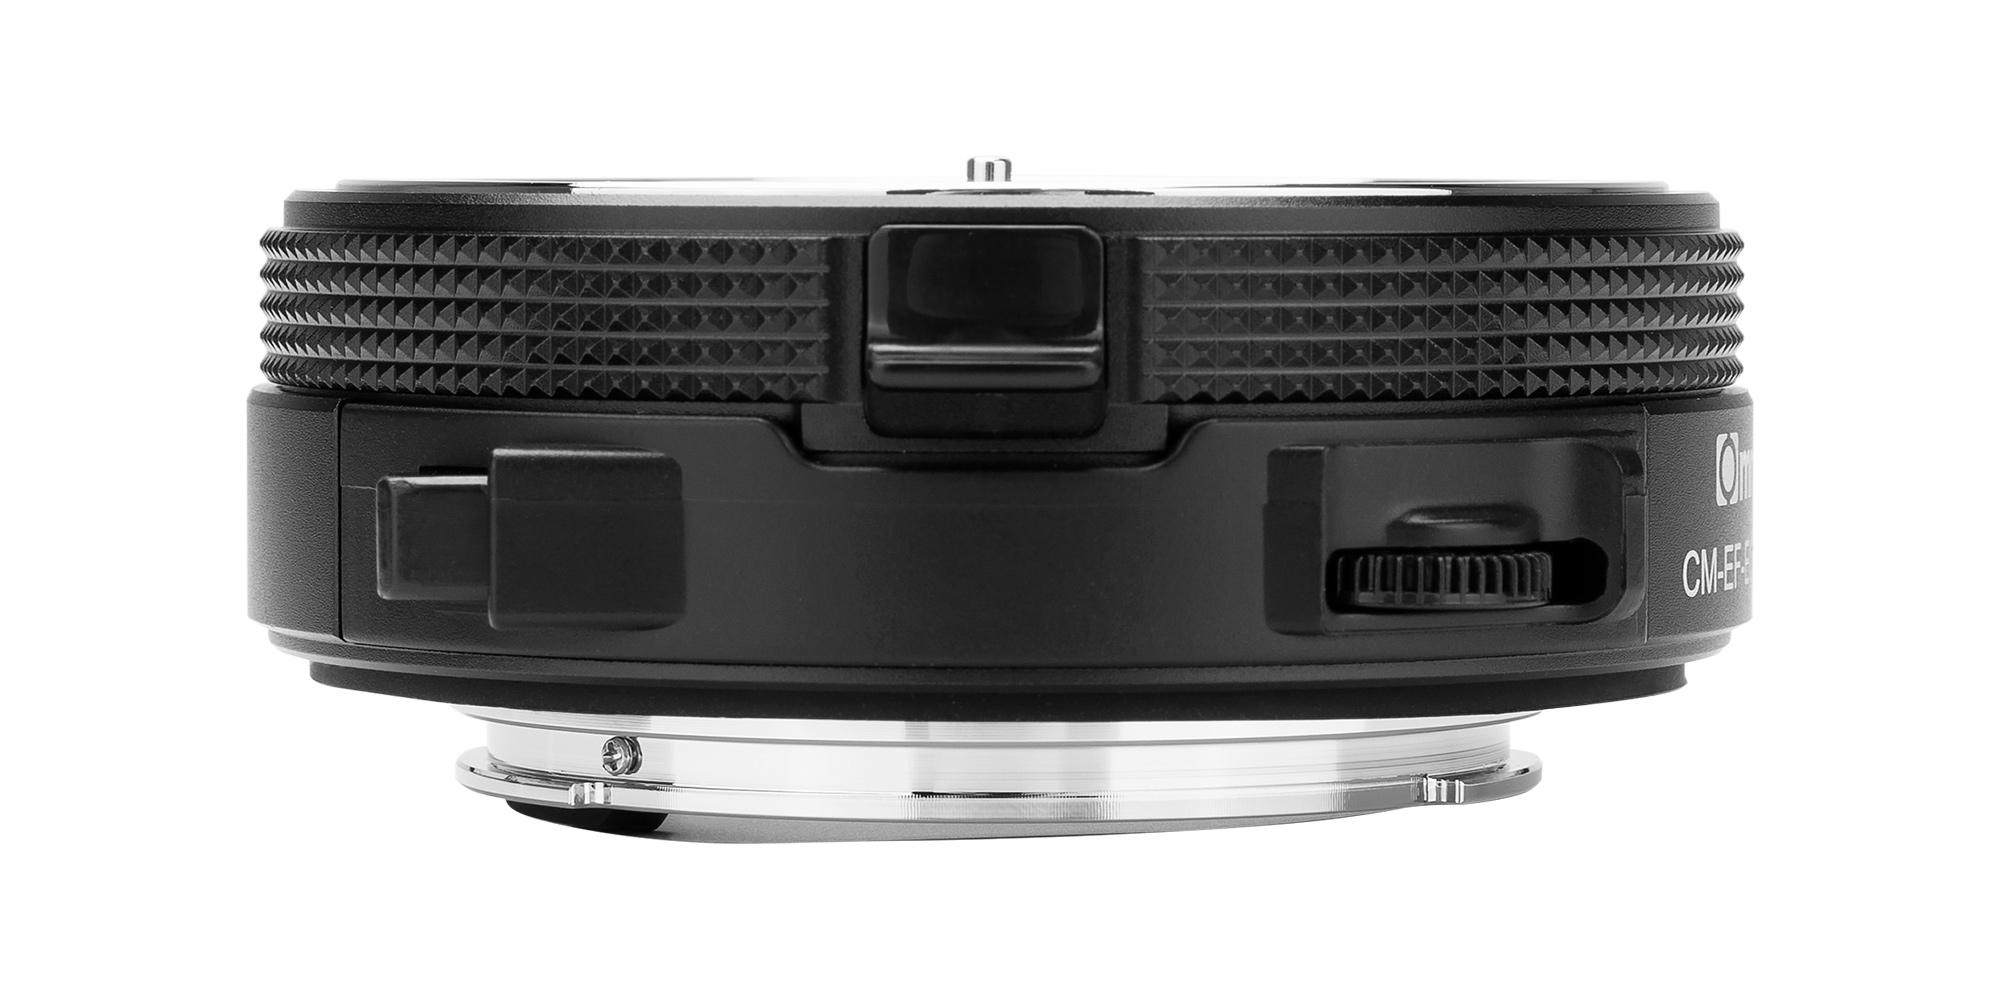 Adapter bagnetowy Commlite CM-EF-EOSR VND